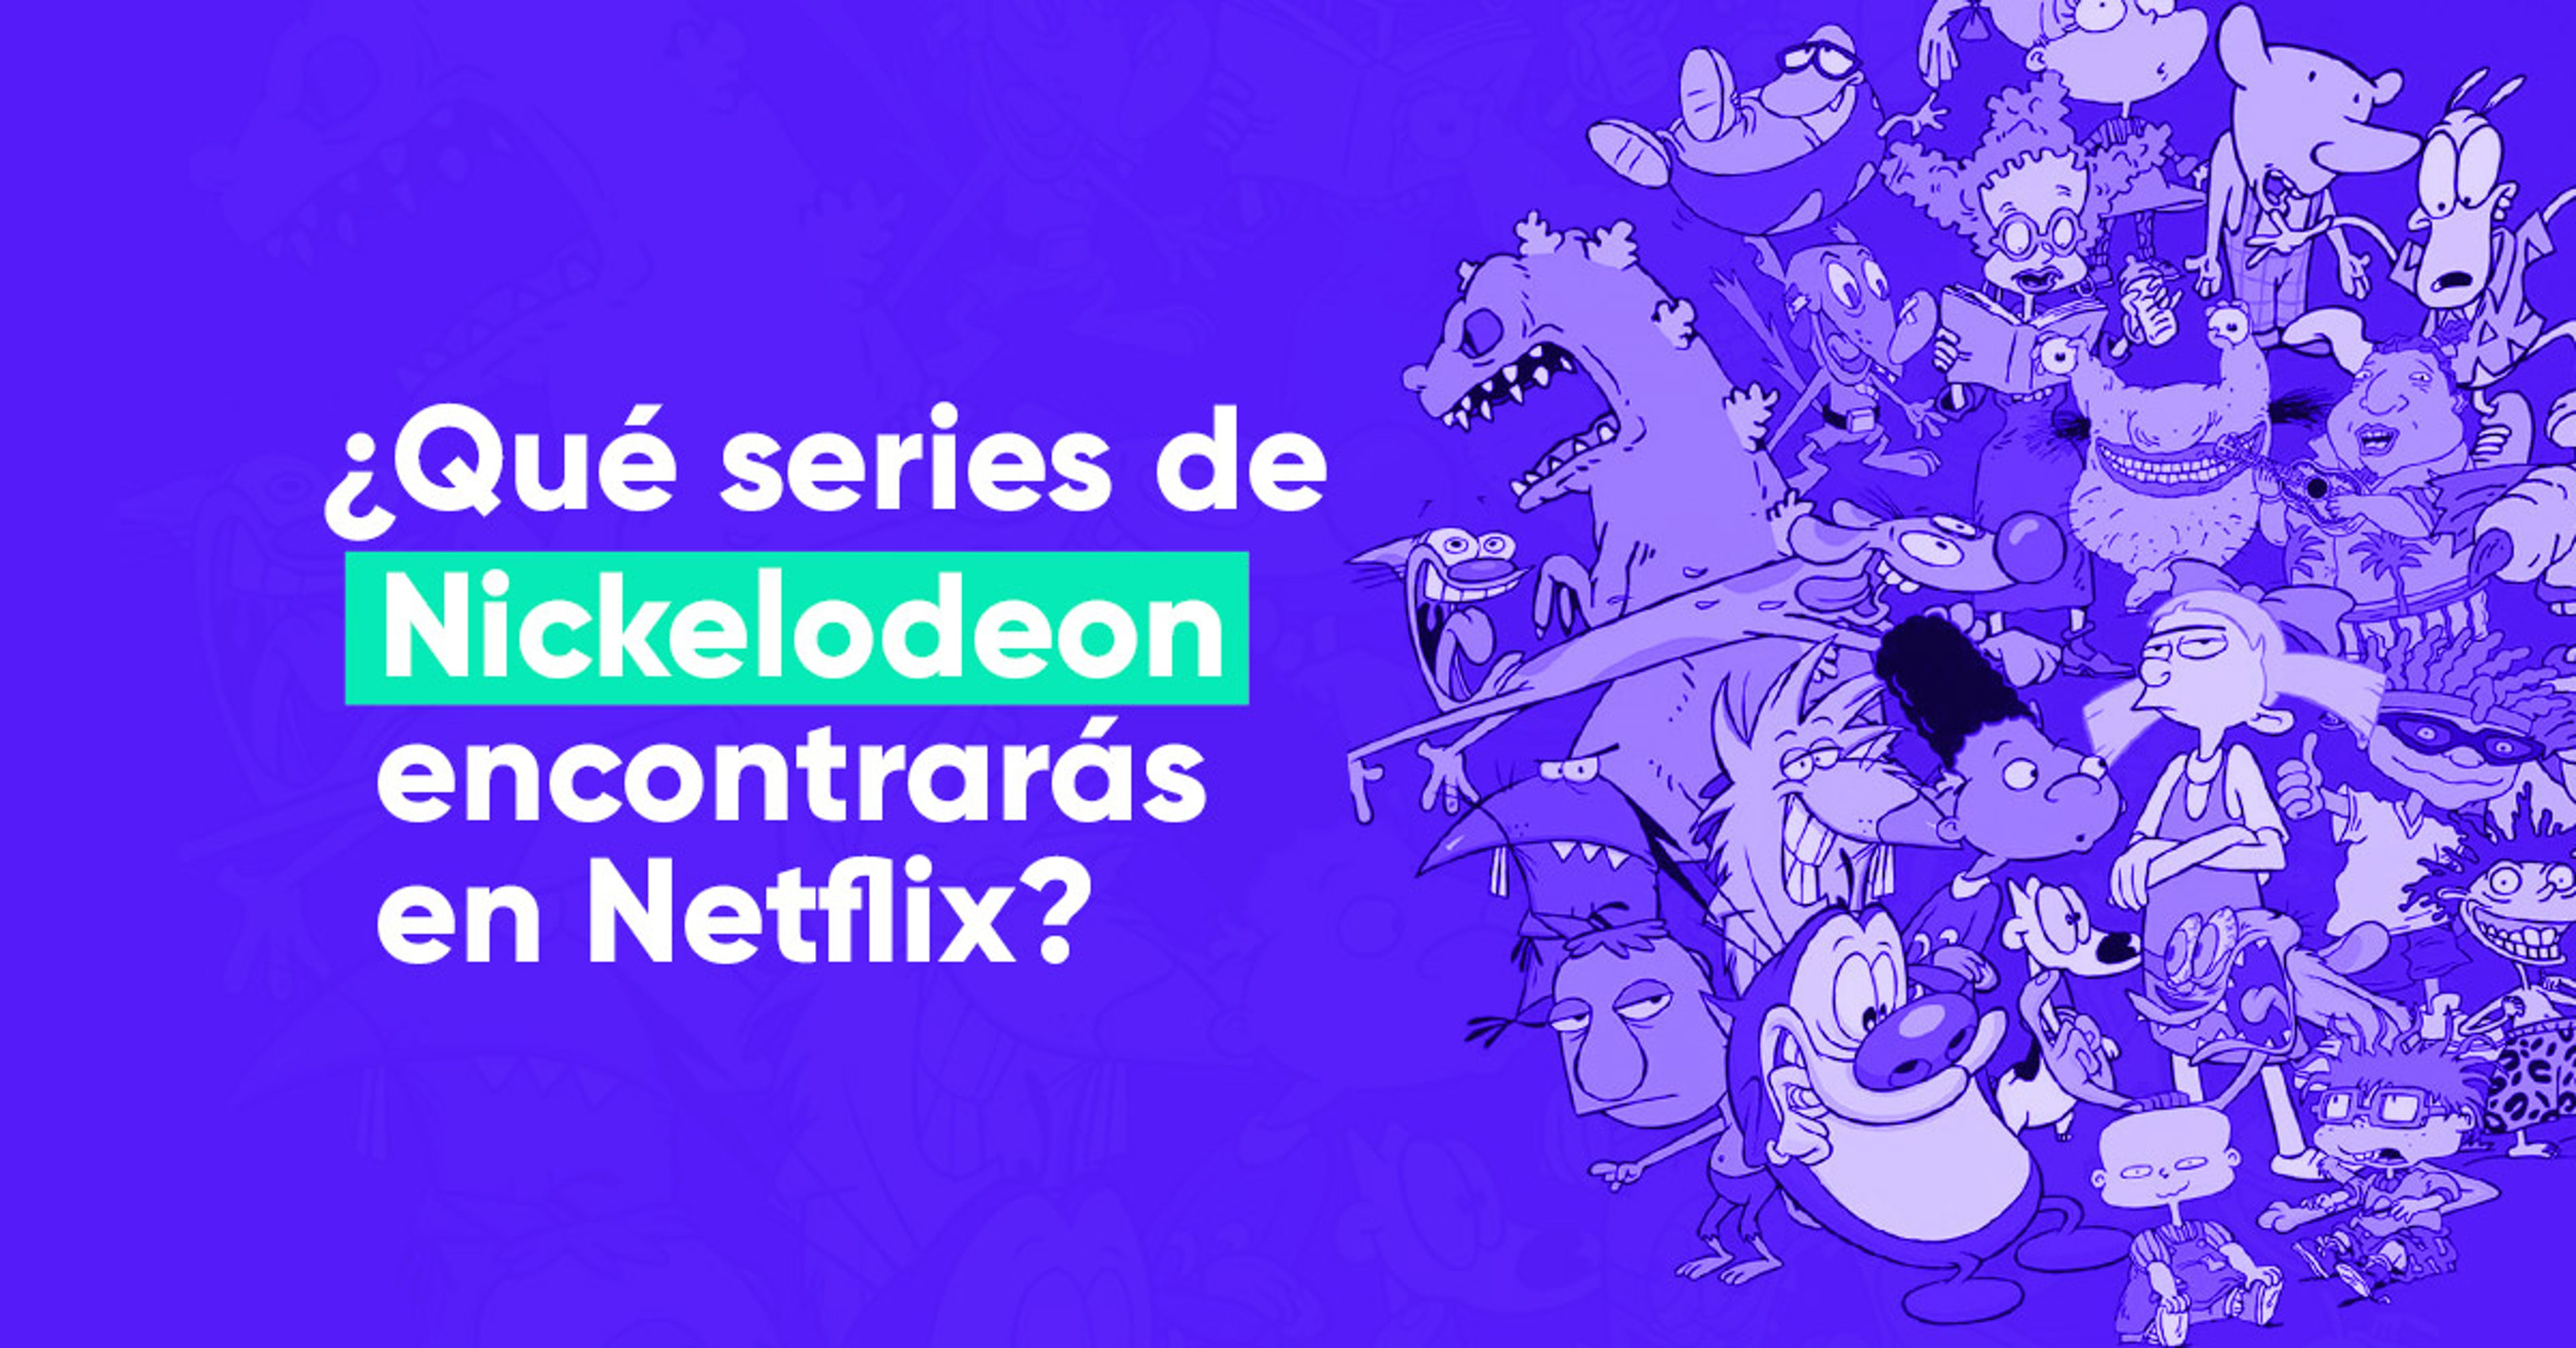 Nickelodeon y Netflix se alían para revivir tu infancia